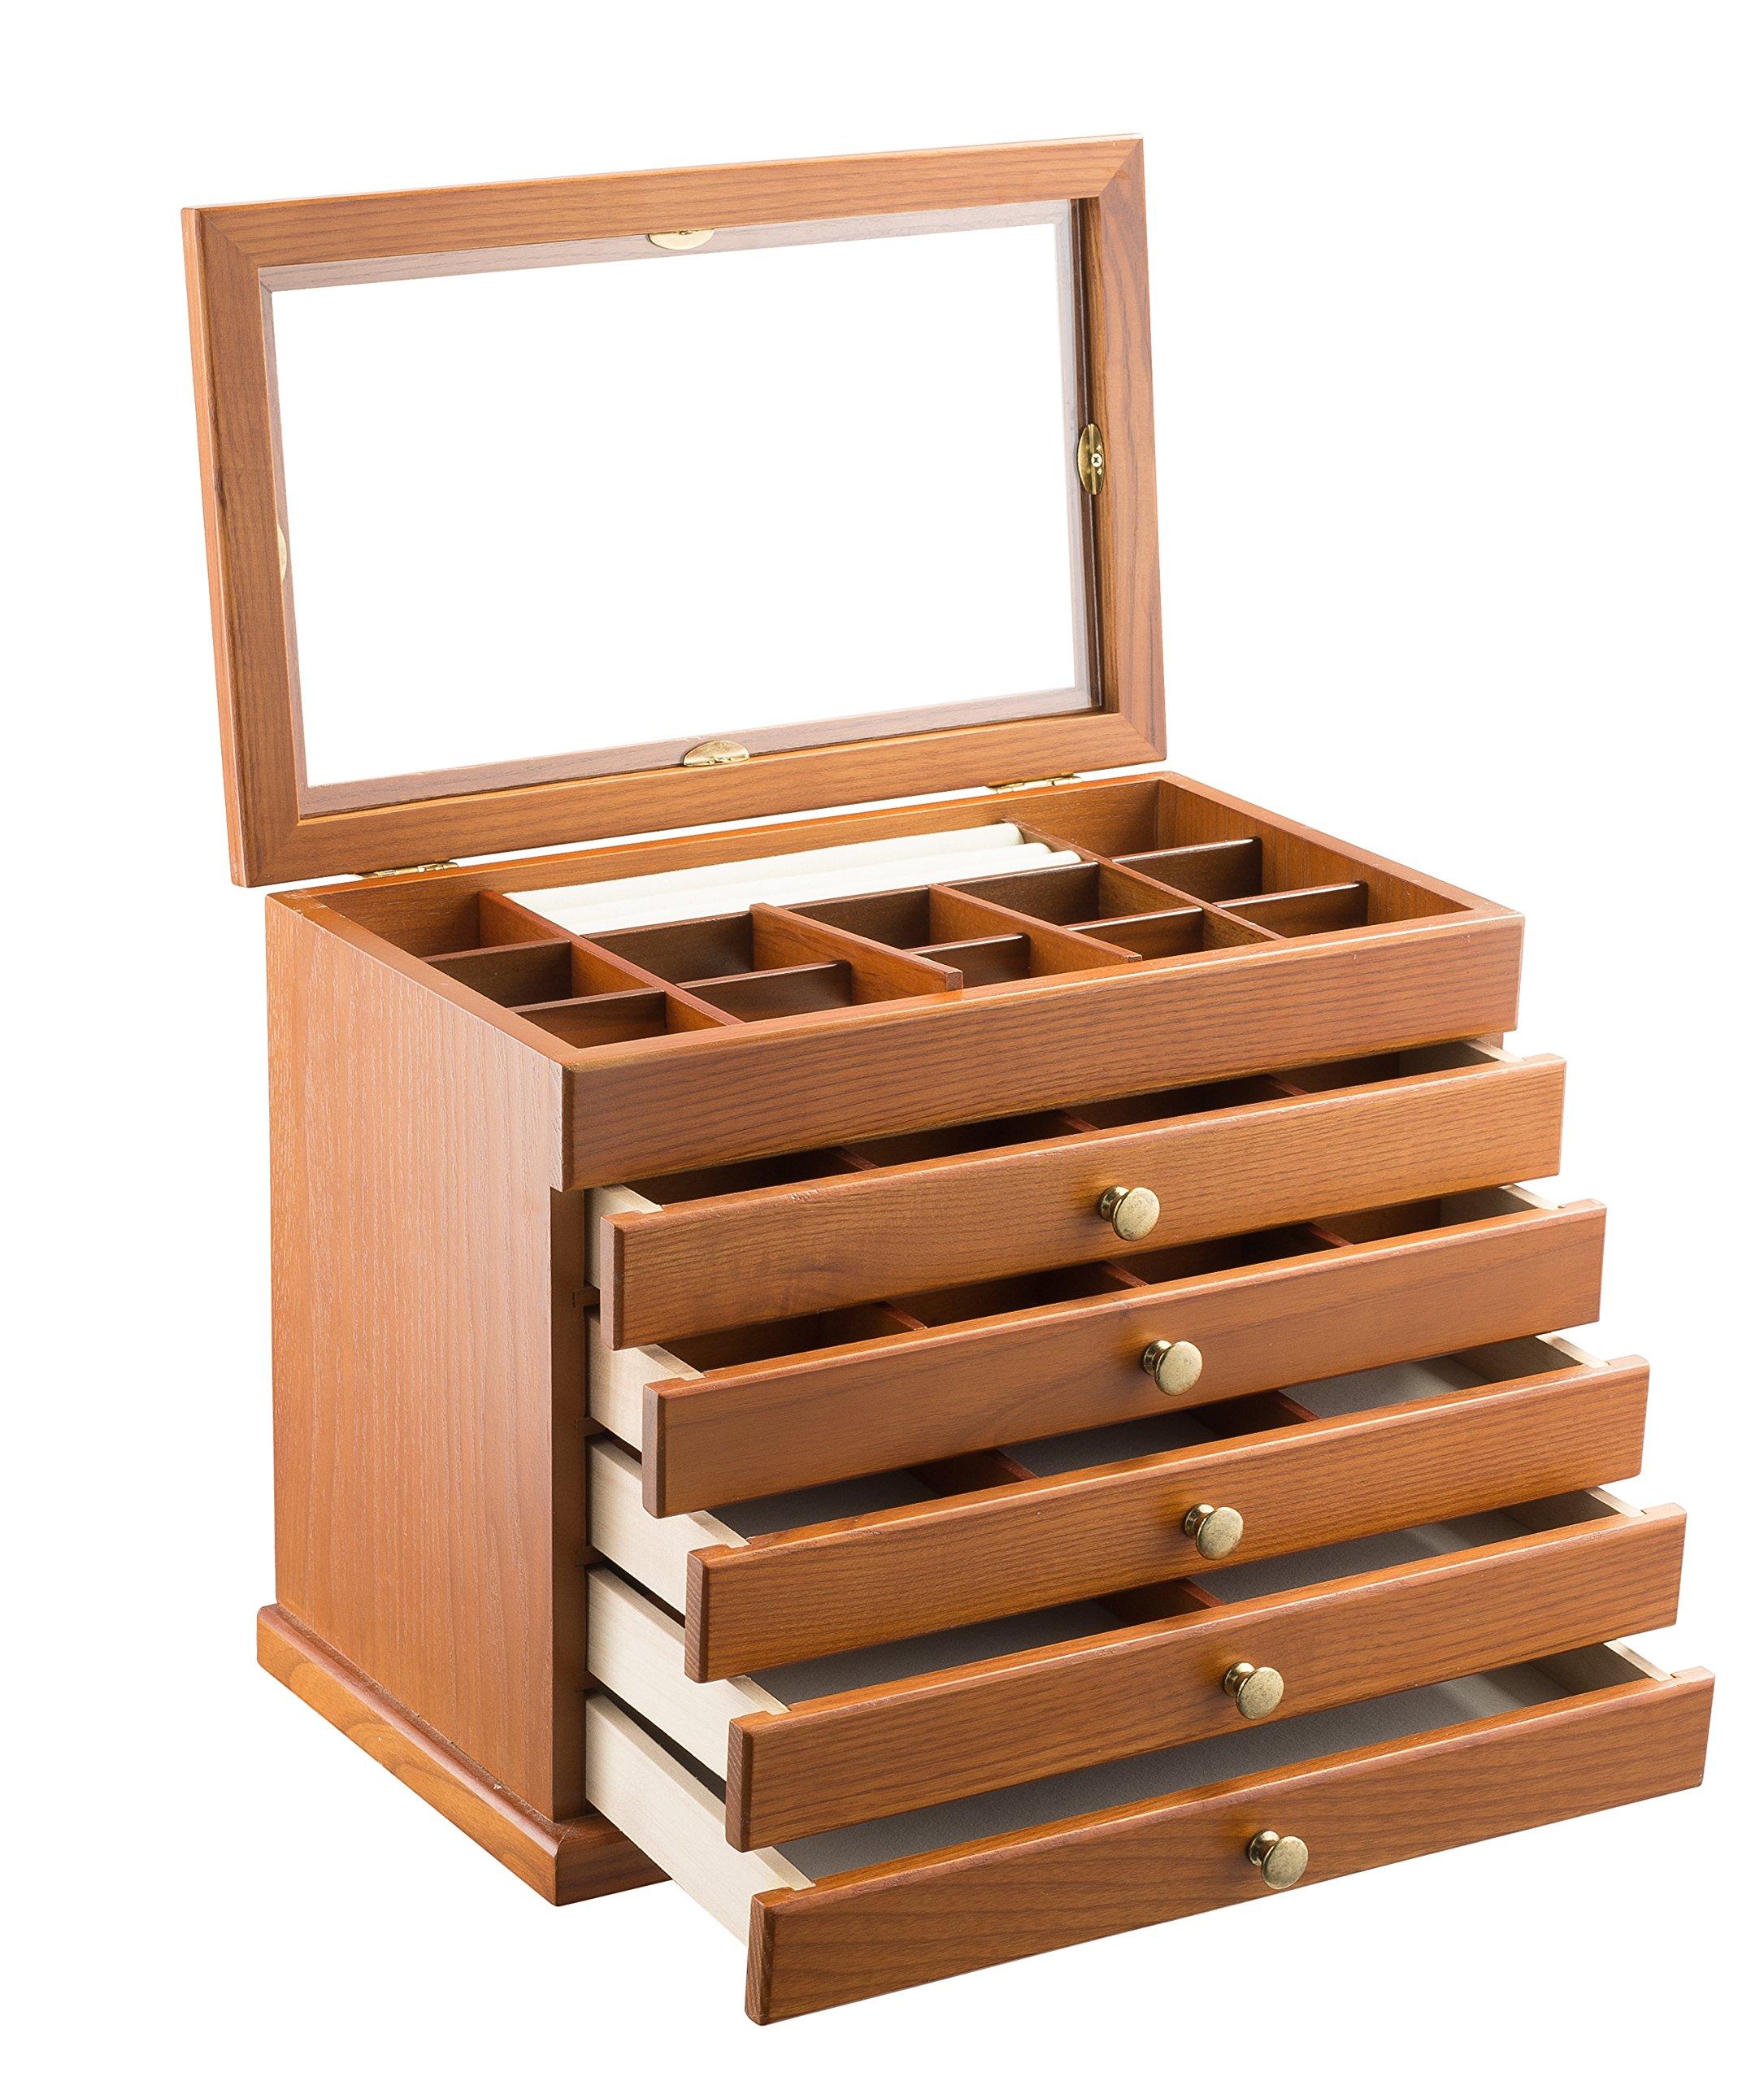 Geff House Large Wood Jewelry Organizer Chest (Honey Oak)